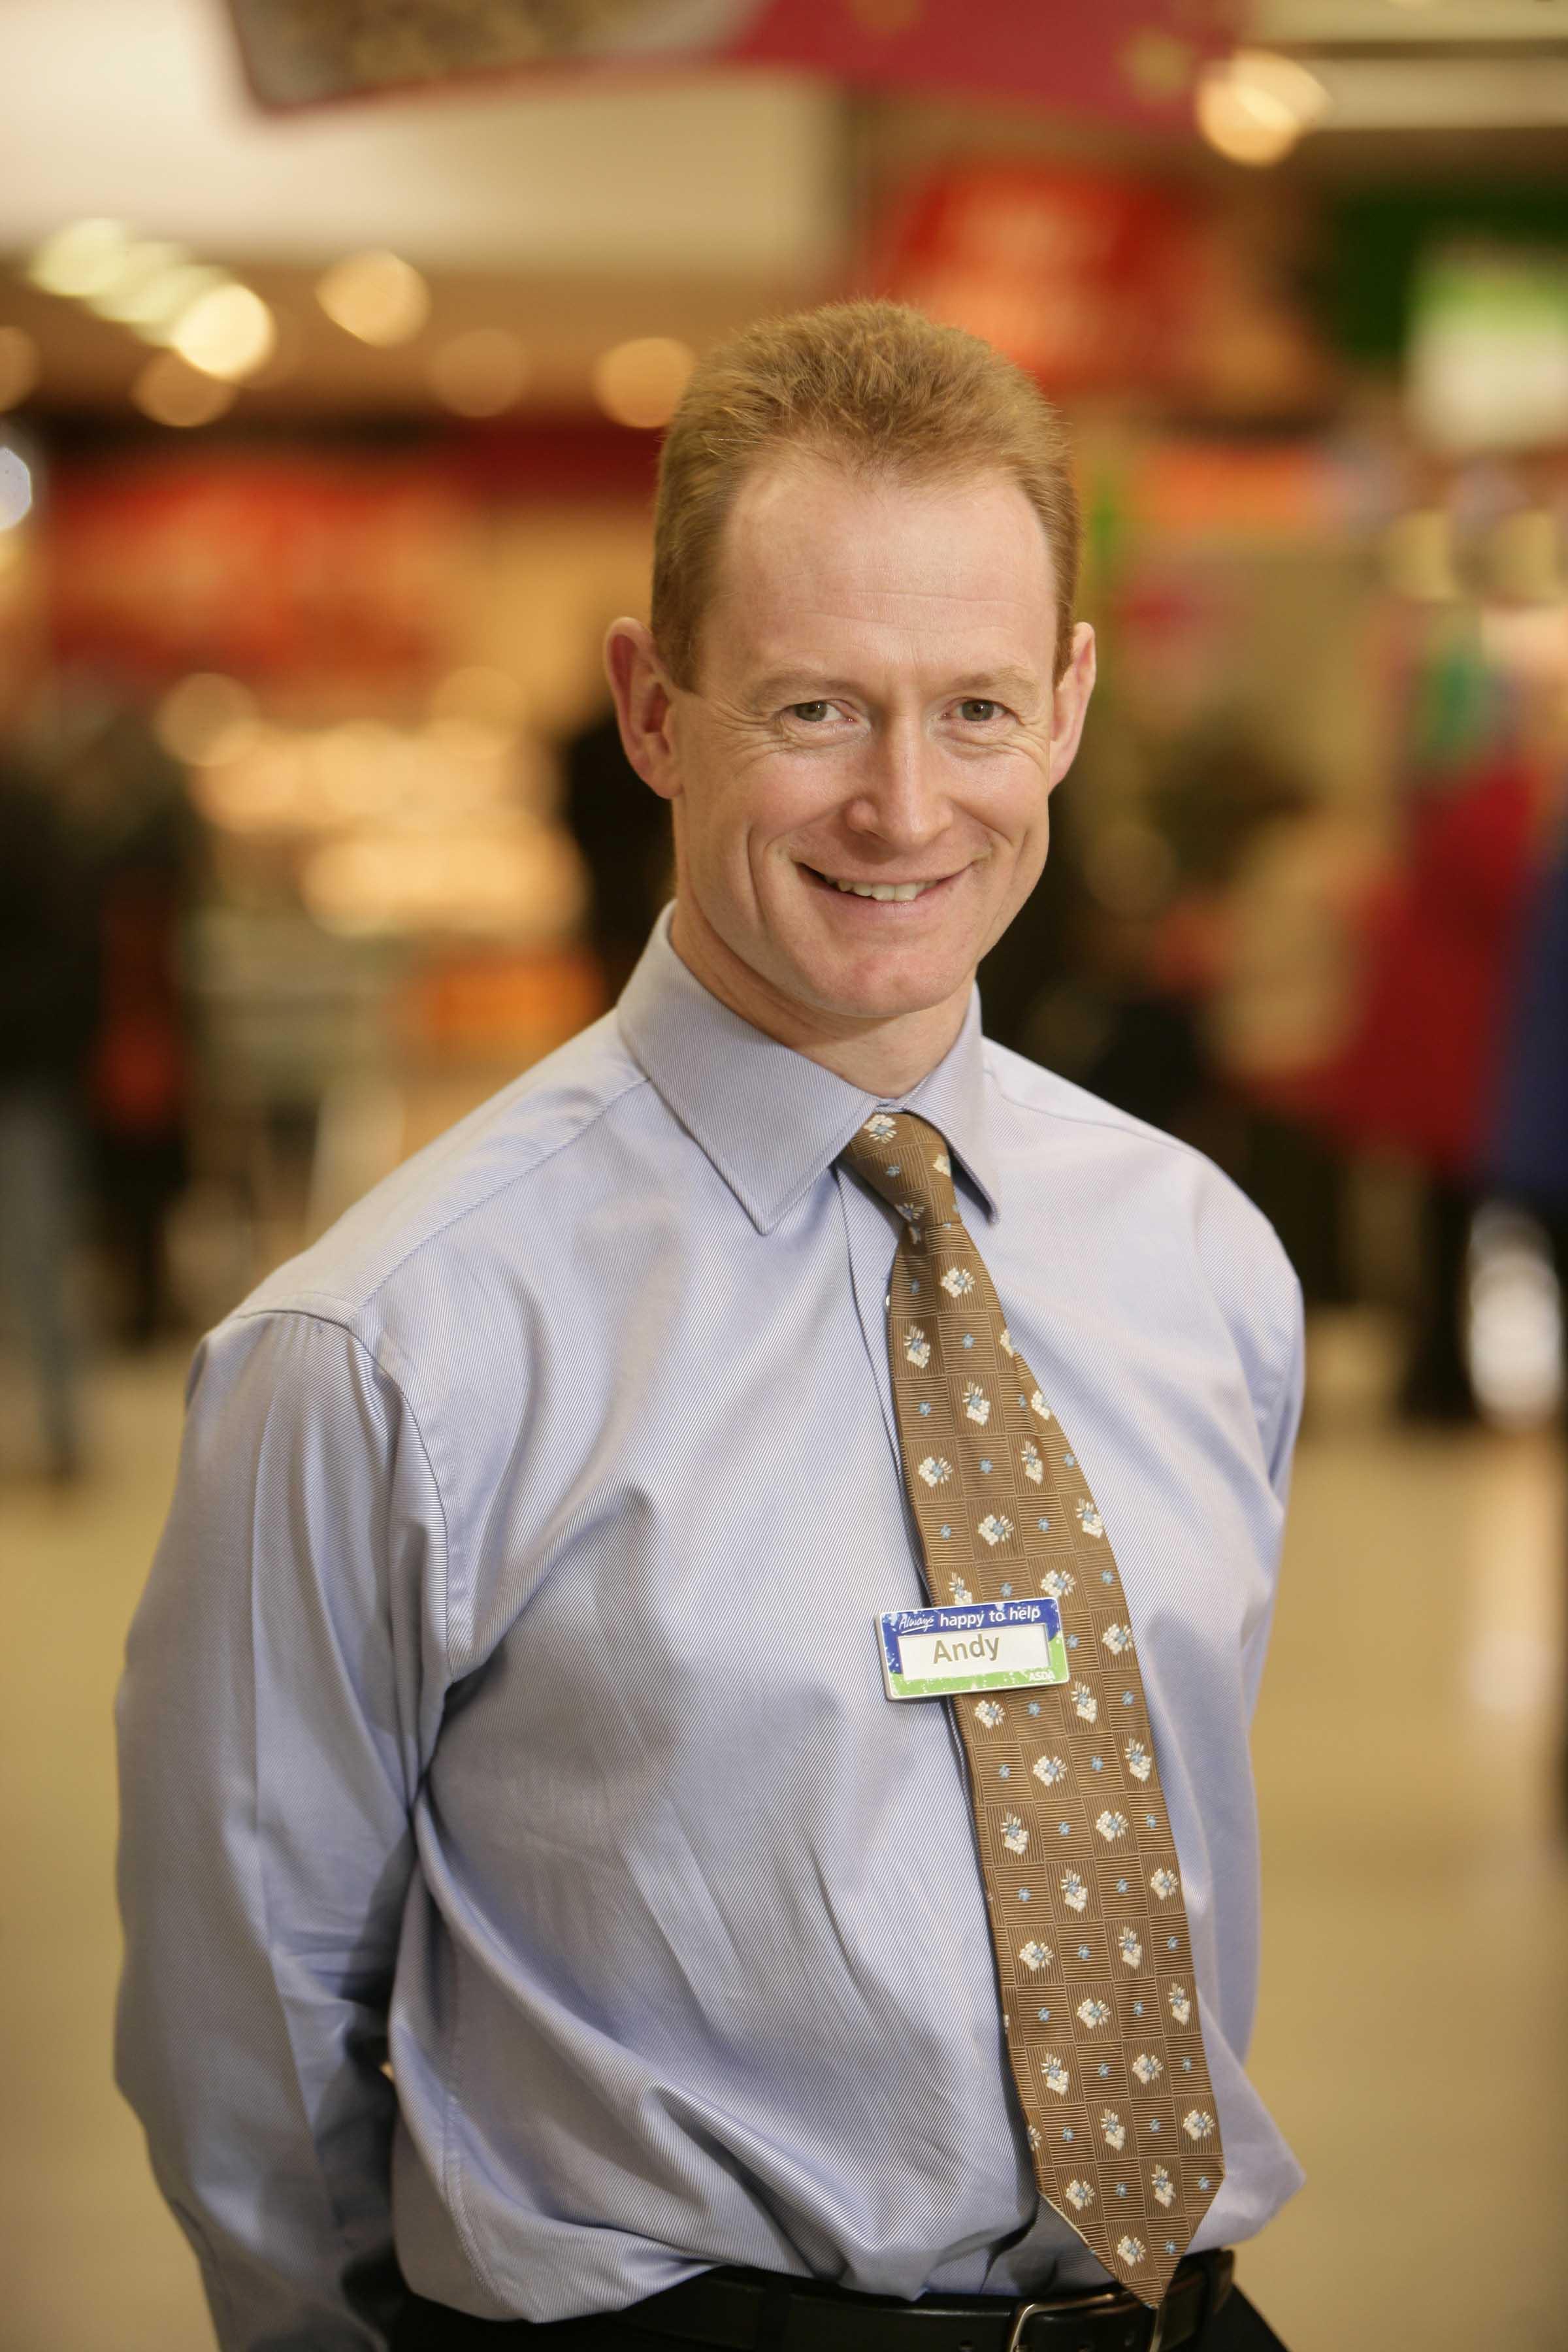 Andy Bond backs entrepreneurial firms